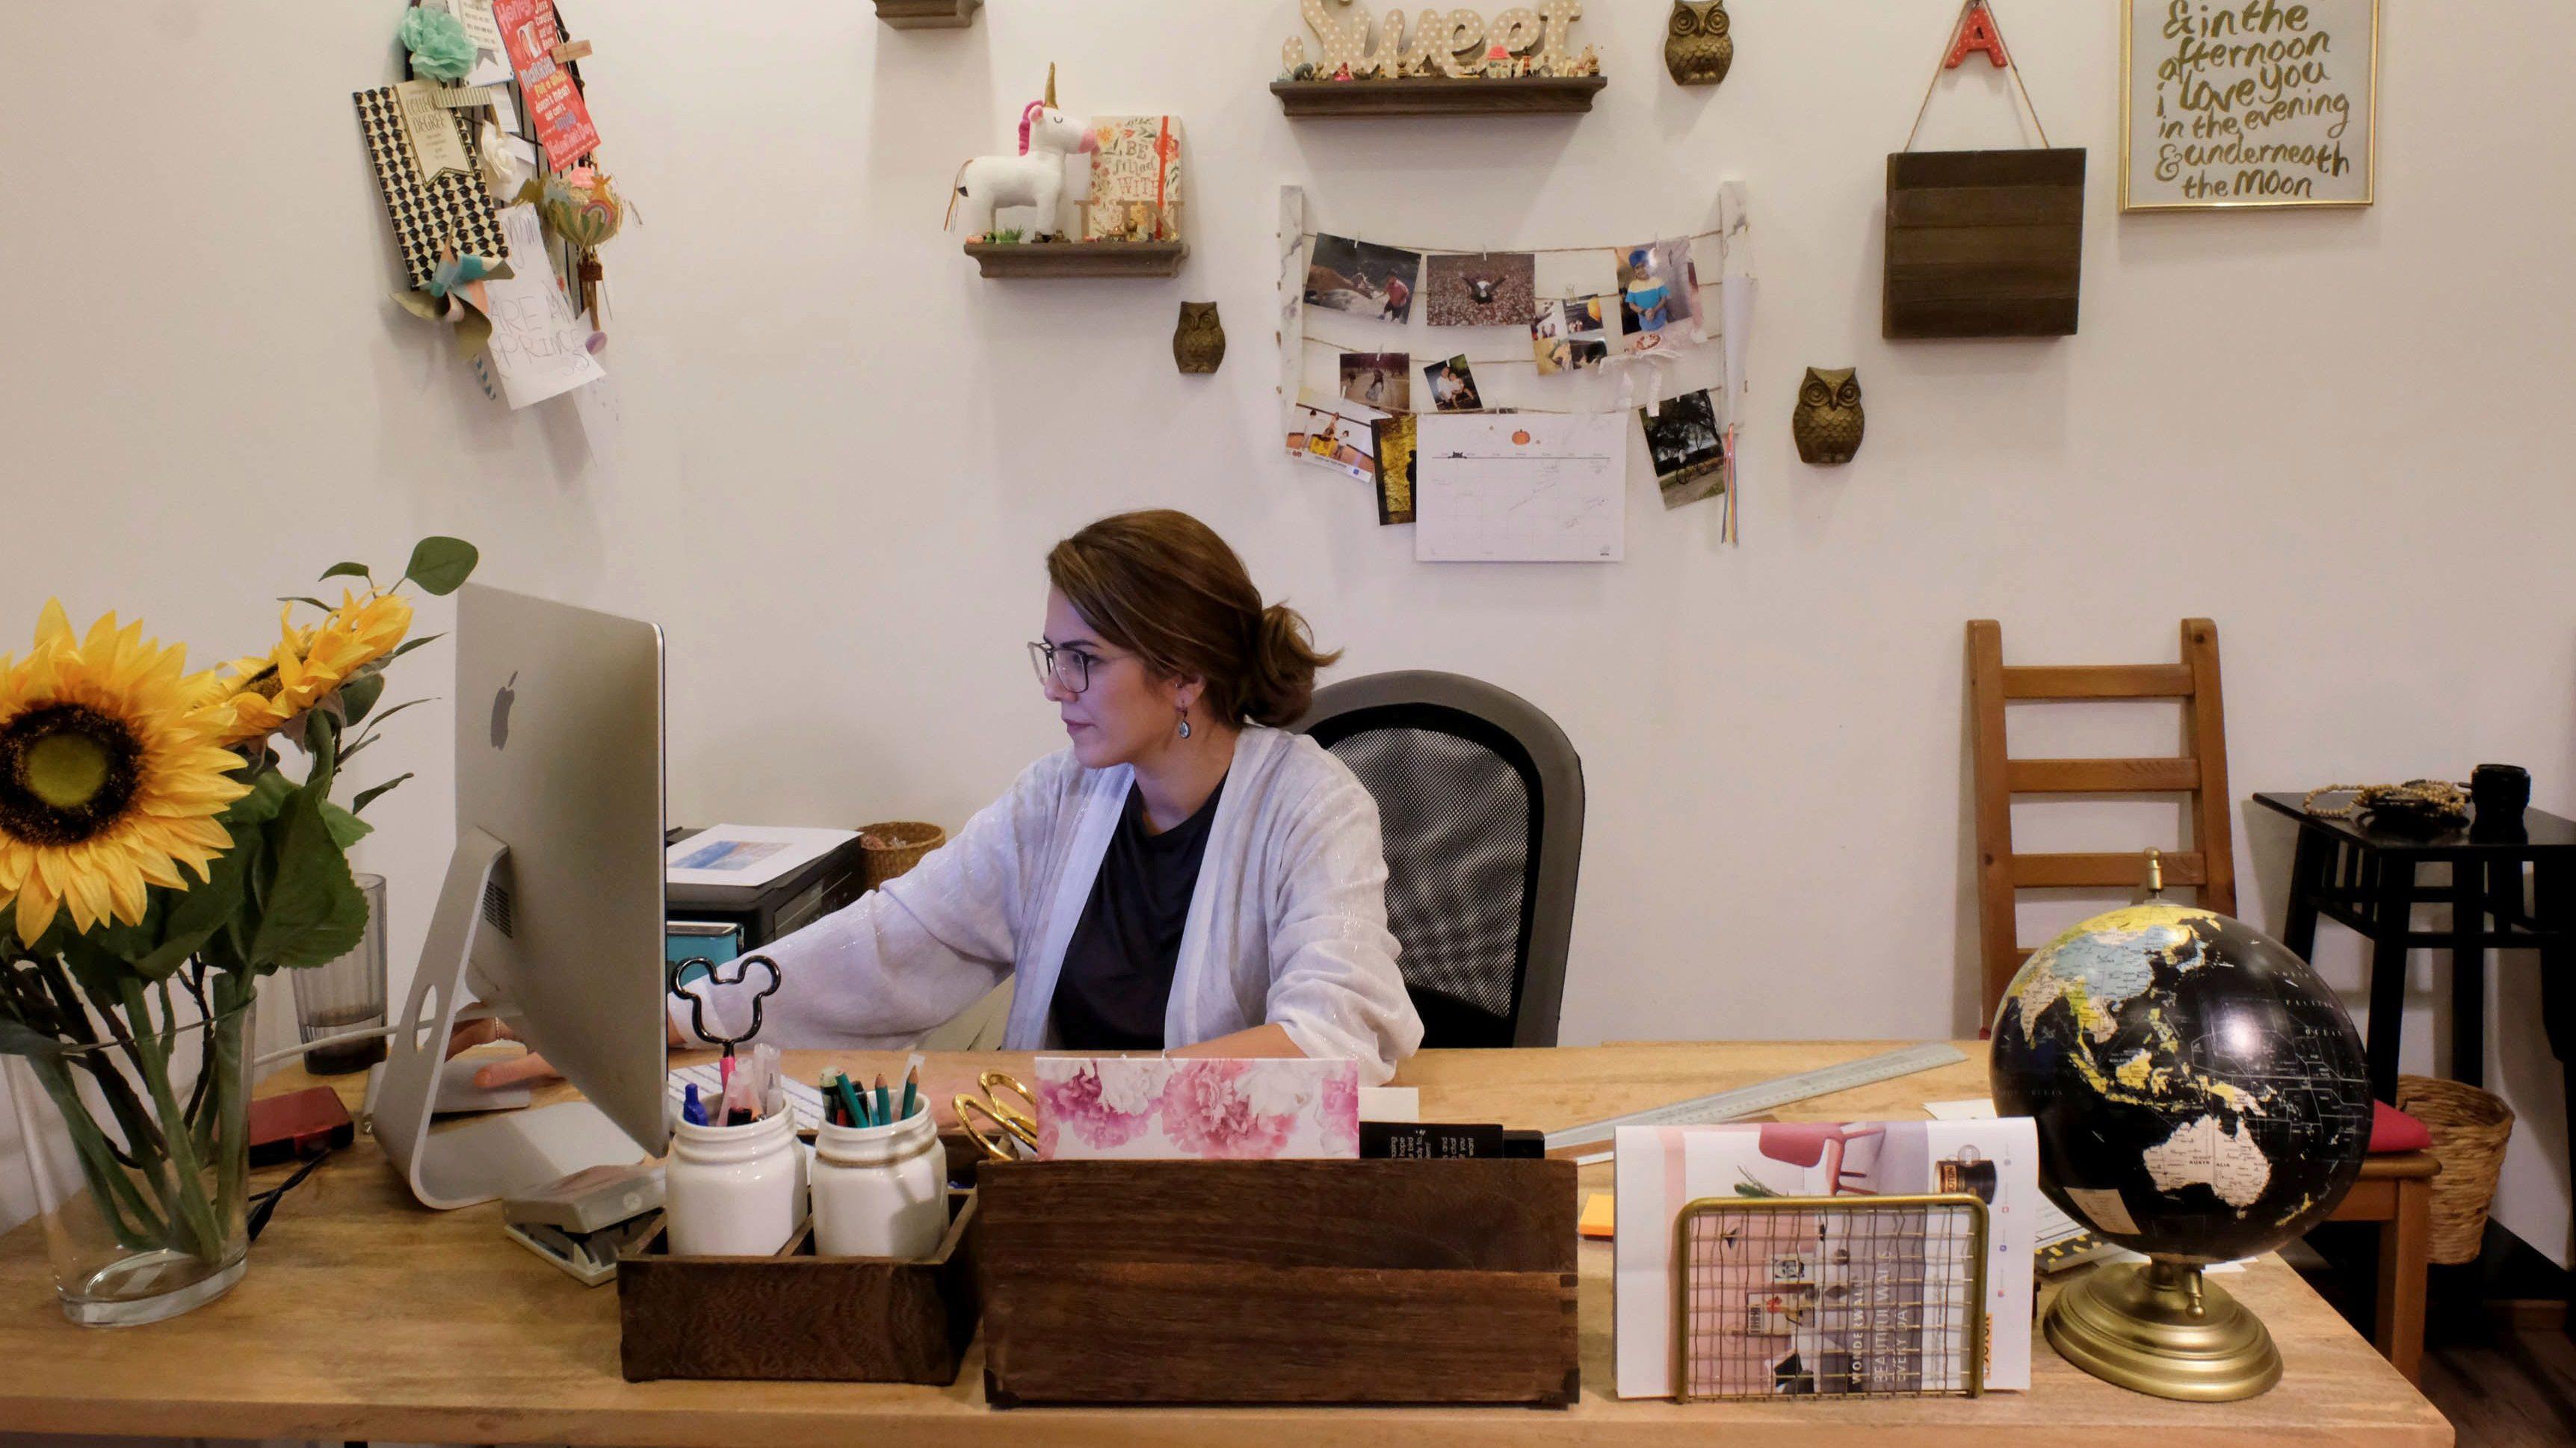 Fiverr's Learn platform teachers freelancers professional skills